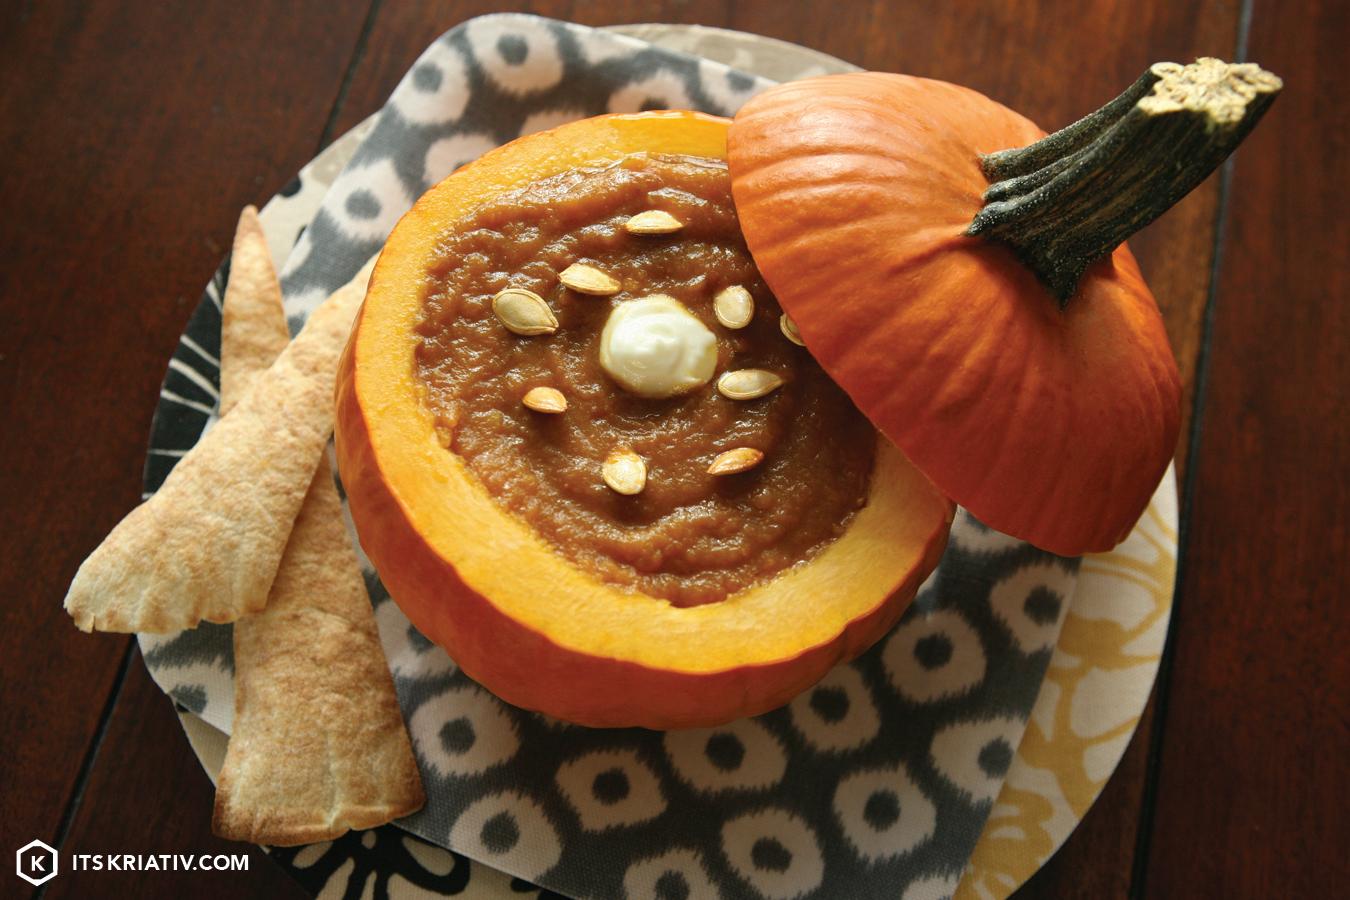 13_Nov_Food-Pumpkin-Soup-01a-01.jpg